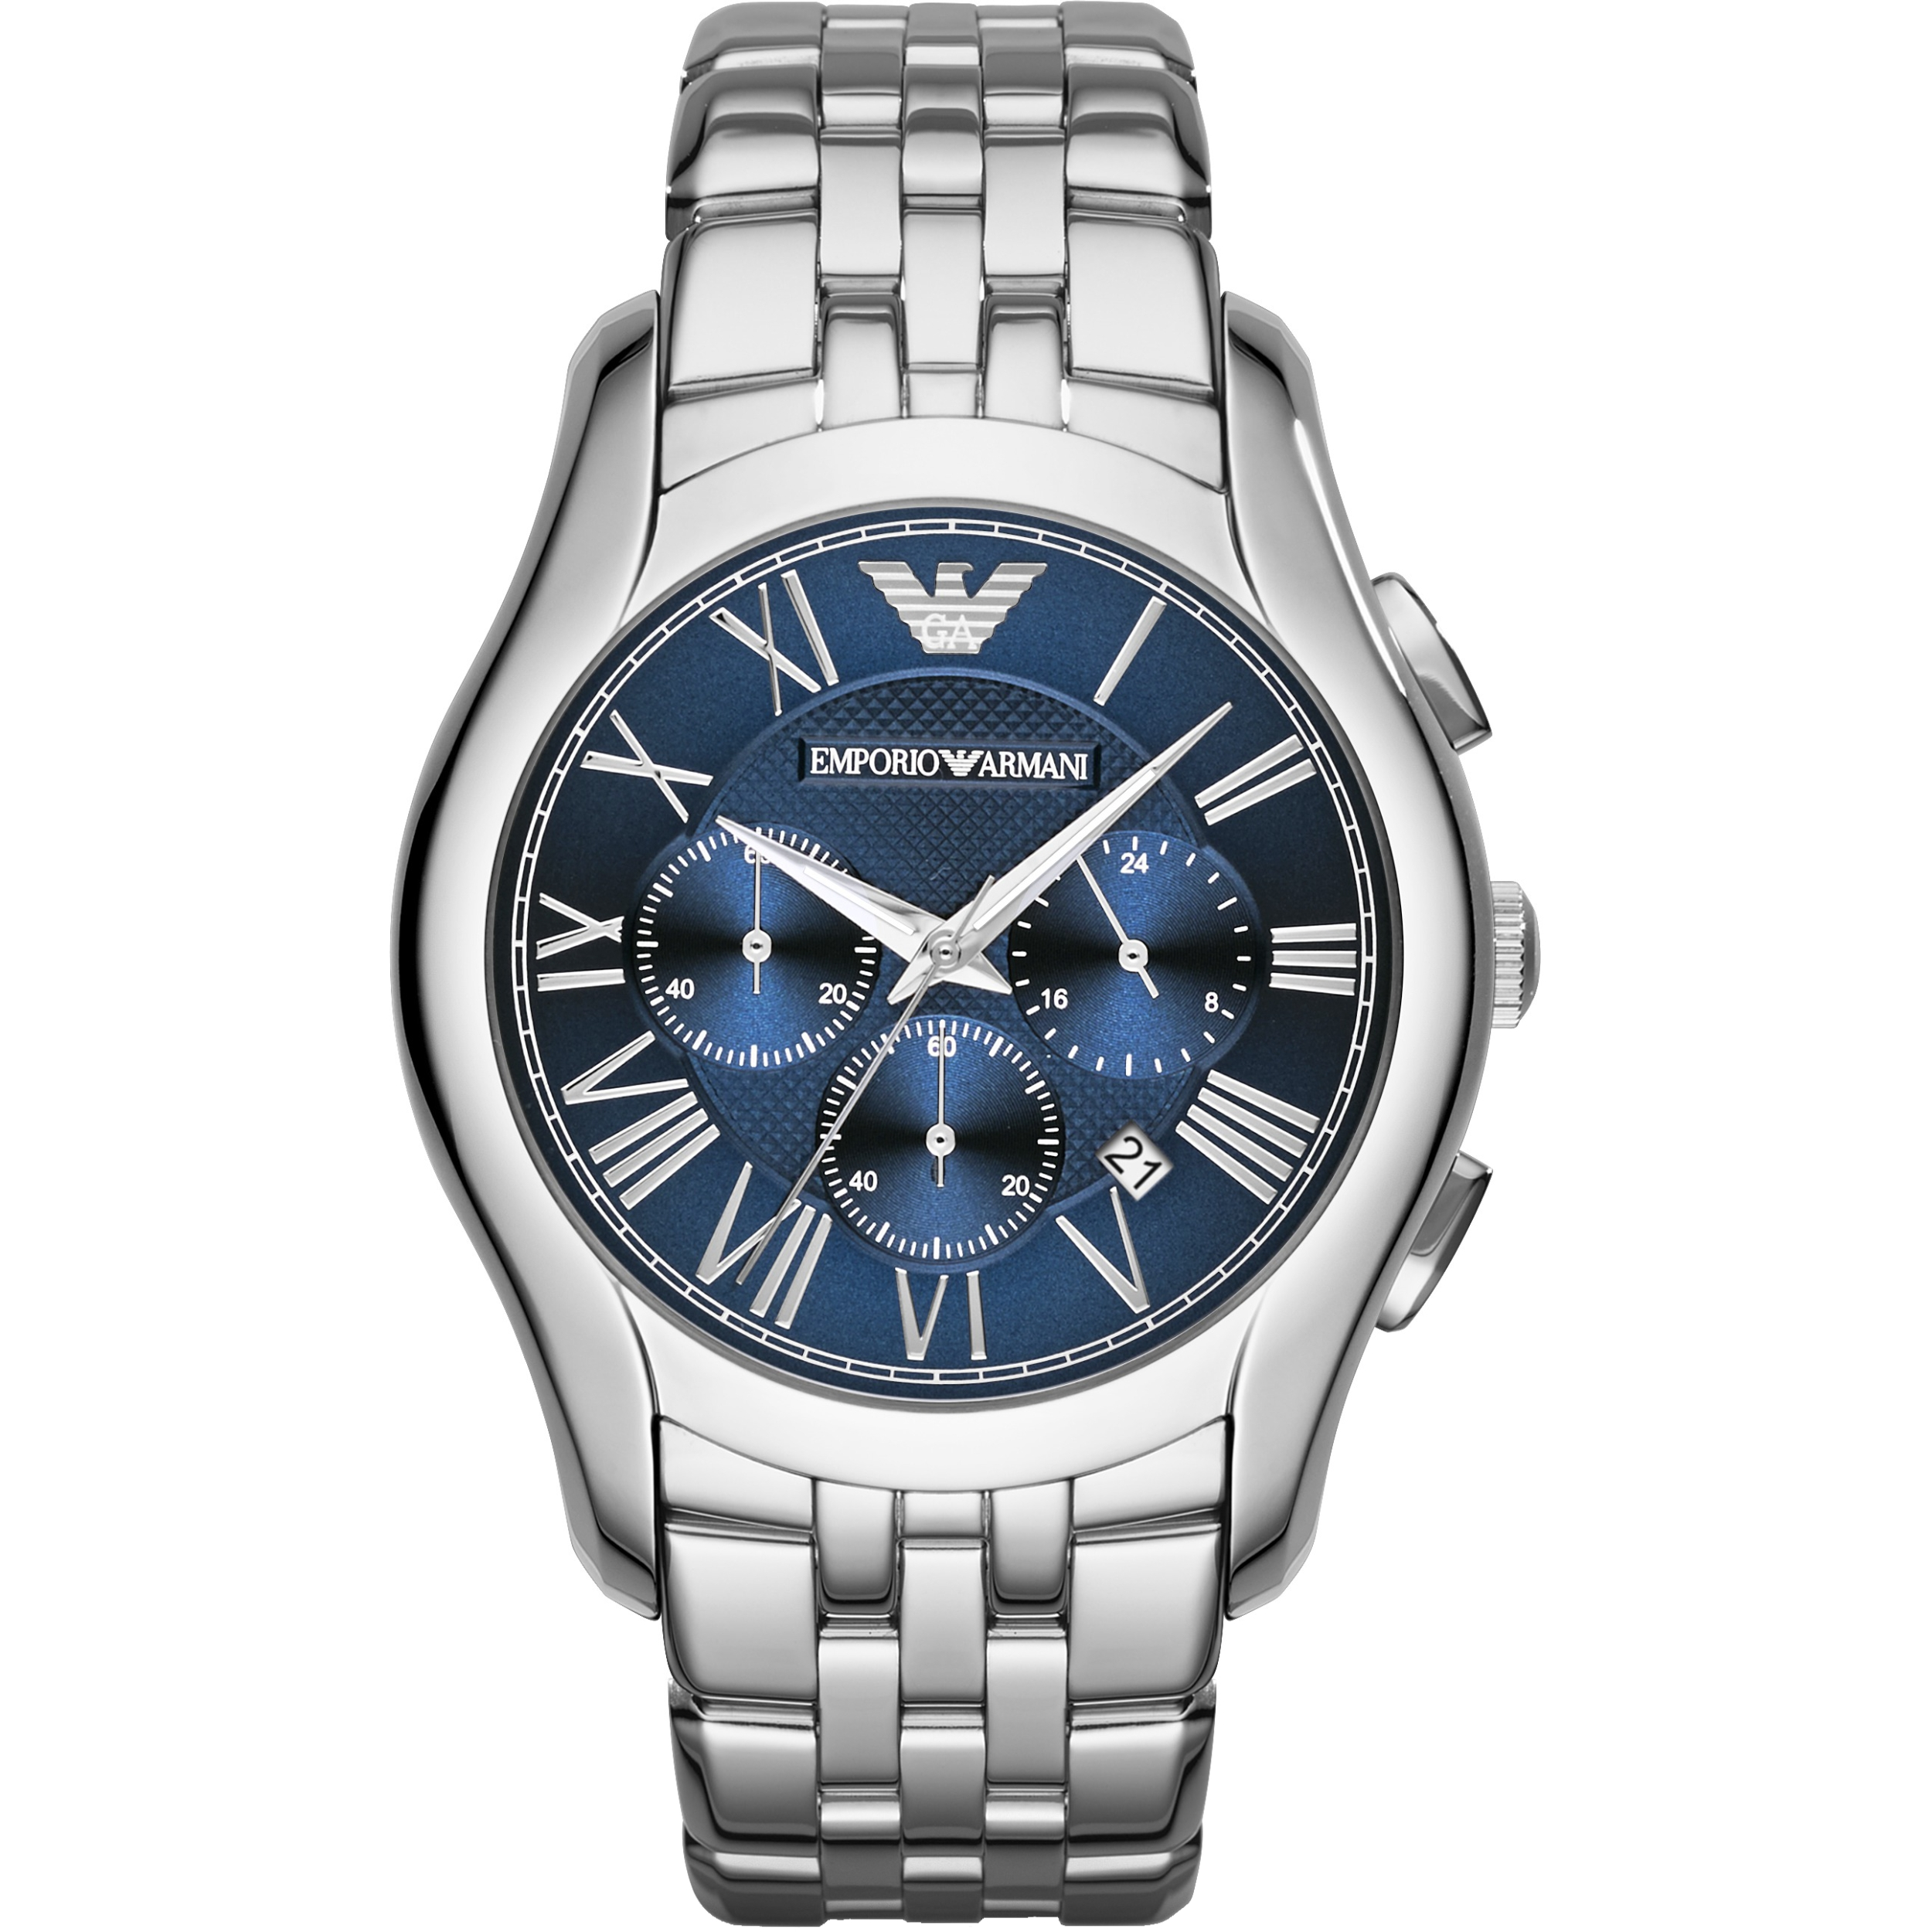 Gents Emporio Armani Chronograph Watch (AR1787)  26cb545a5d3